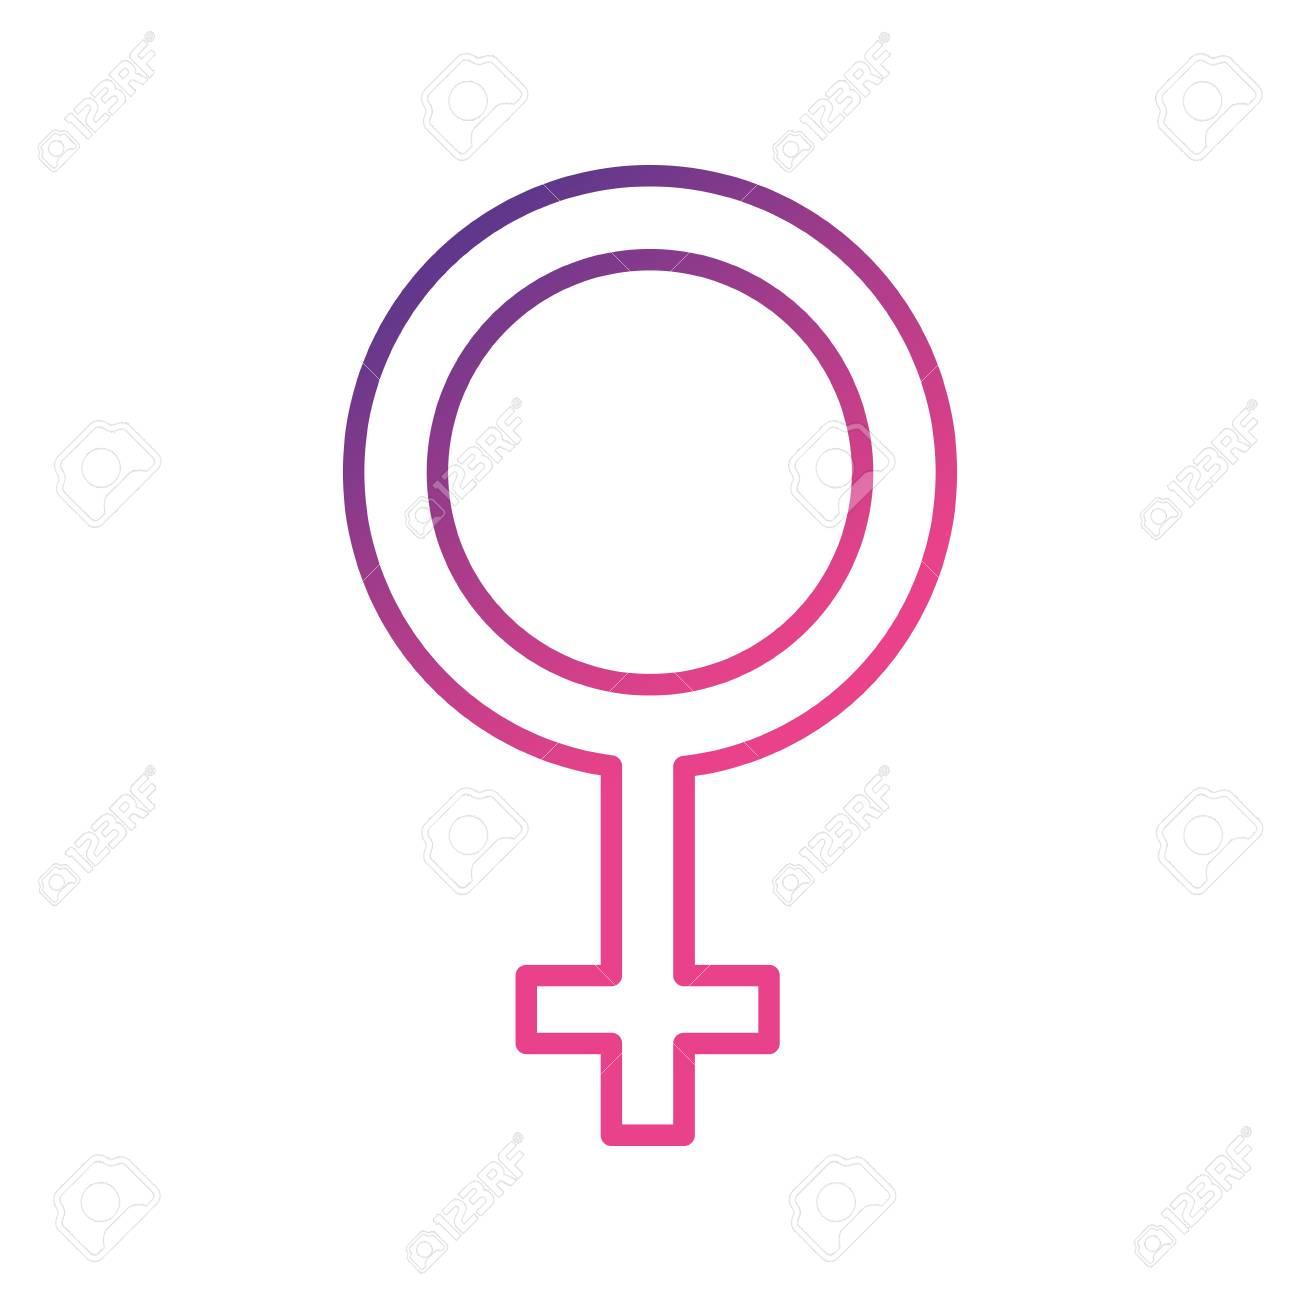 Female Gender Symbol To Special Event Vector Illustration Royalty